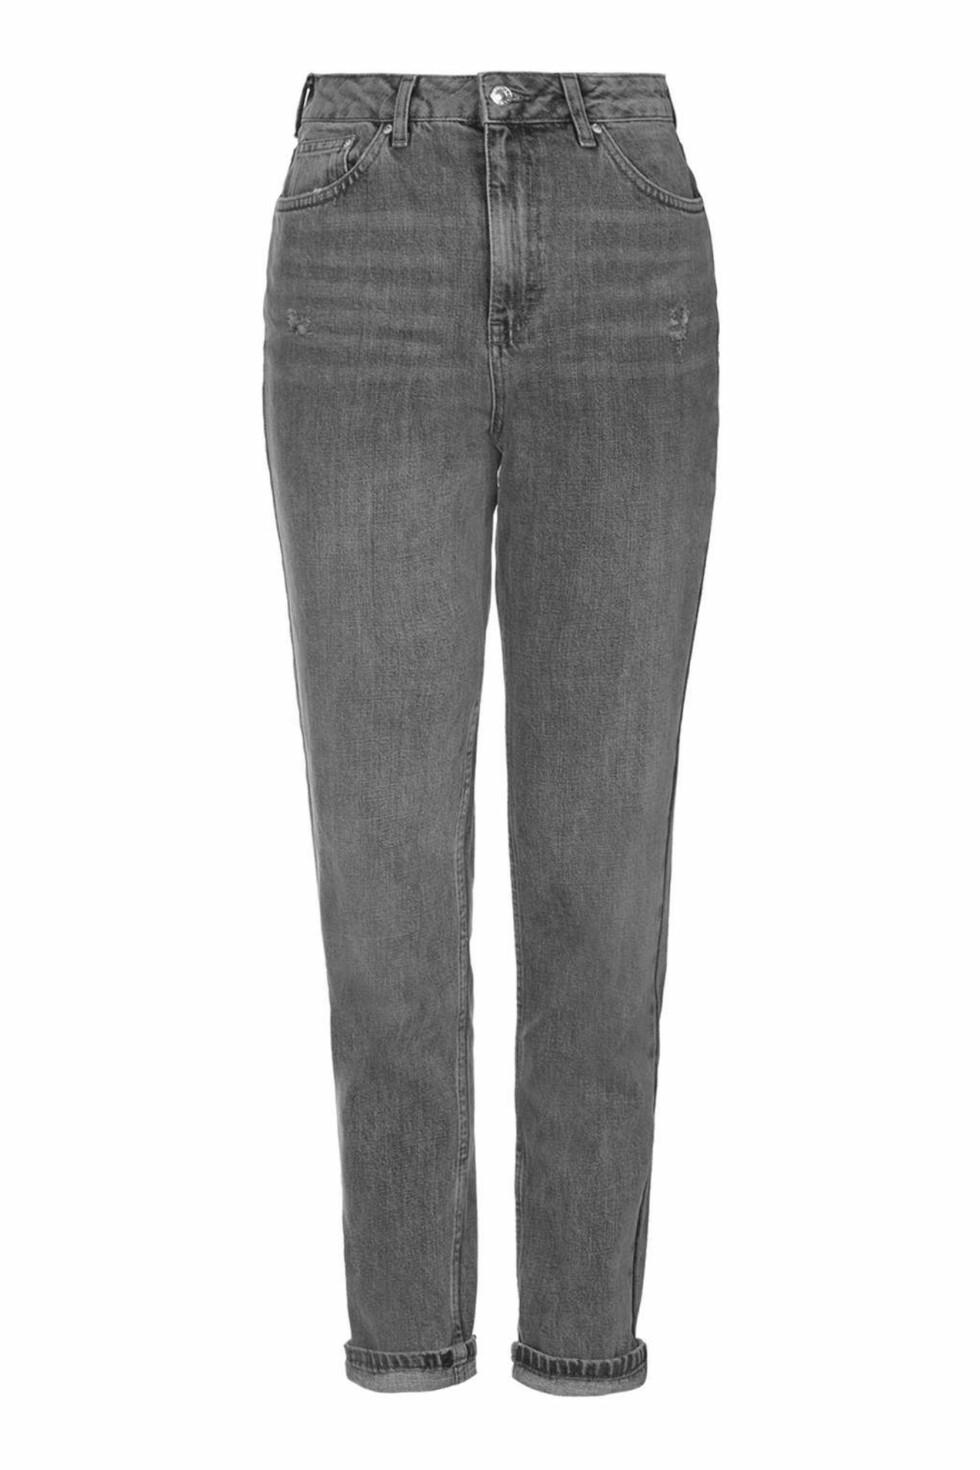 <strong>Jeans fra Topshop | kr 416 | http:</strong>//www.topshop.com/en/tsuk/product/clothing-427/jeans-446/moto-grey-mom-jeans-5188652?bi=0&ps=20